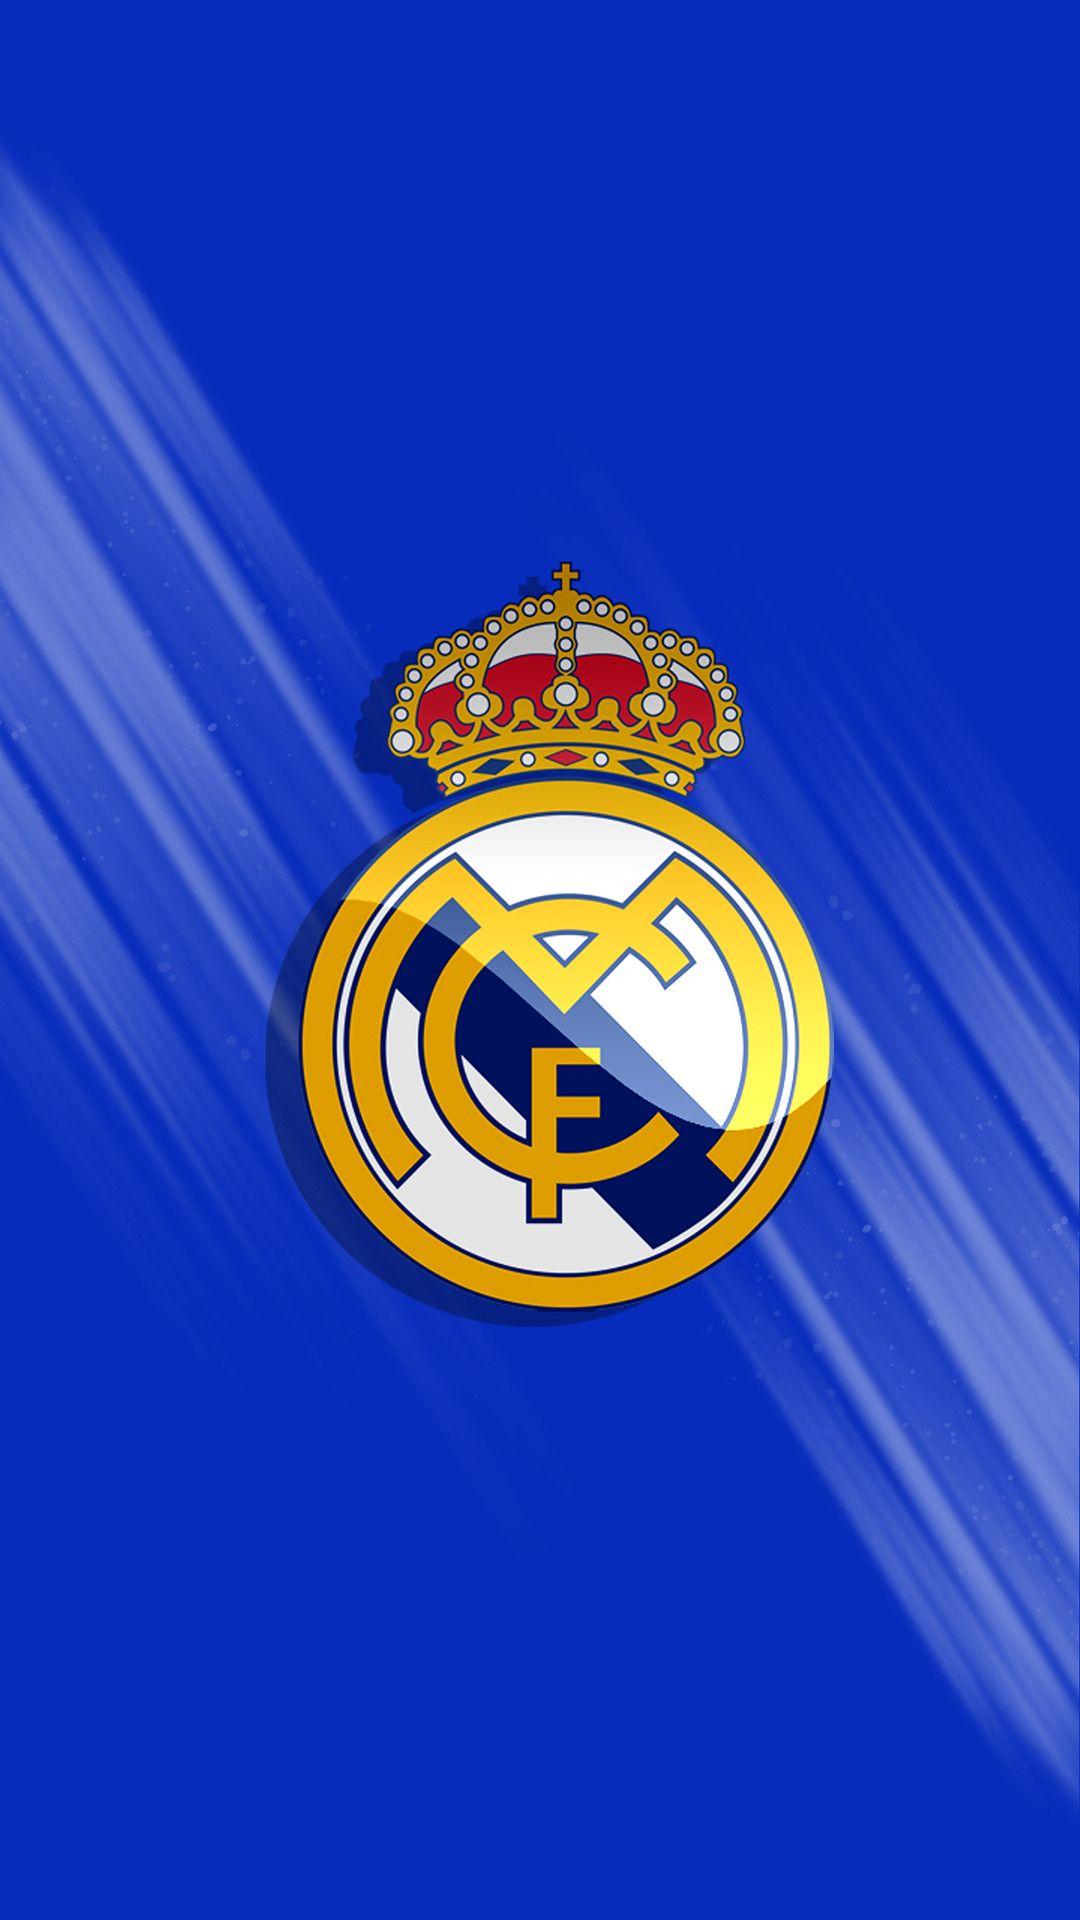 Lock Screen Real Madrid Wallpaper Iphone Hd Football In 2020 Real Madrid Wallpapers Real Madrid Logo Wallpapers Madrid Wallpaper